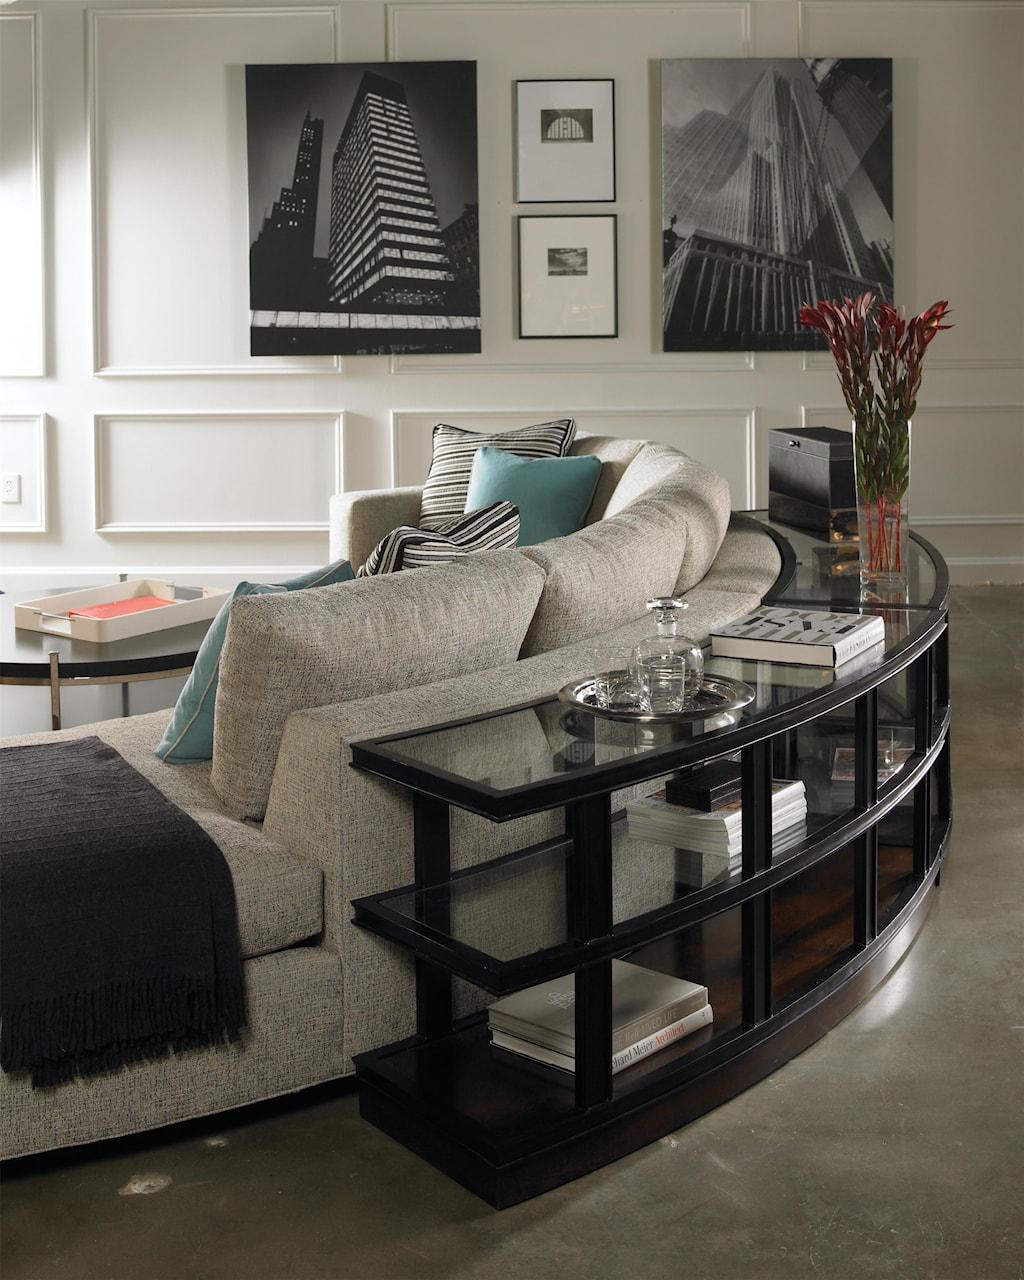 Vanguard Furniture Michael Weiss W180 LAJ W180 RG Curved e Arm